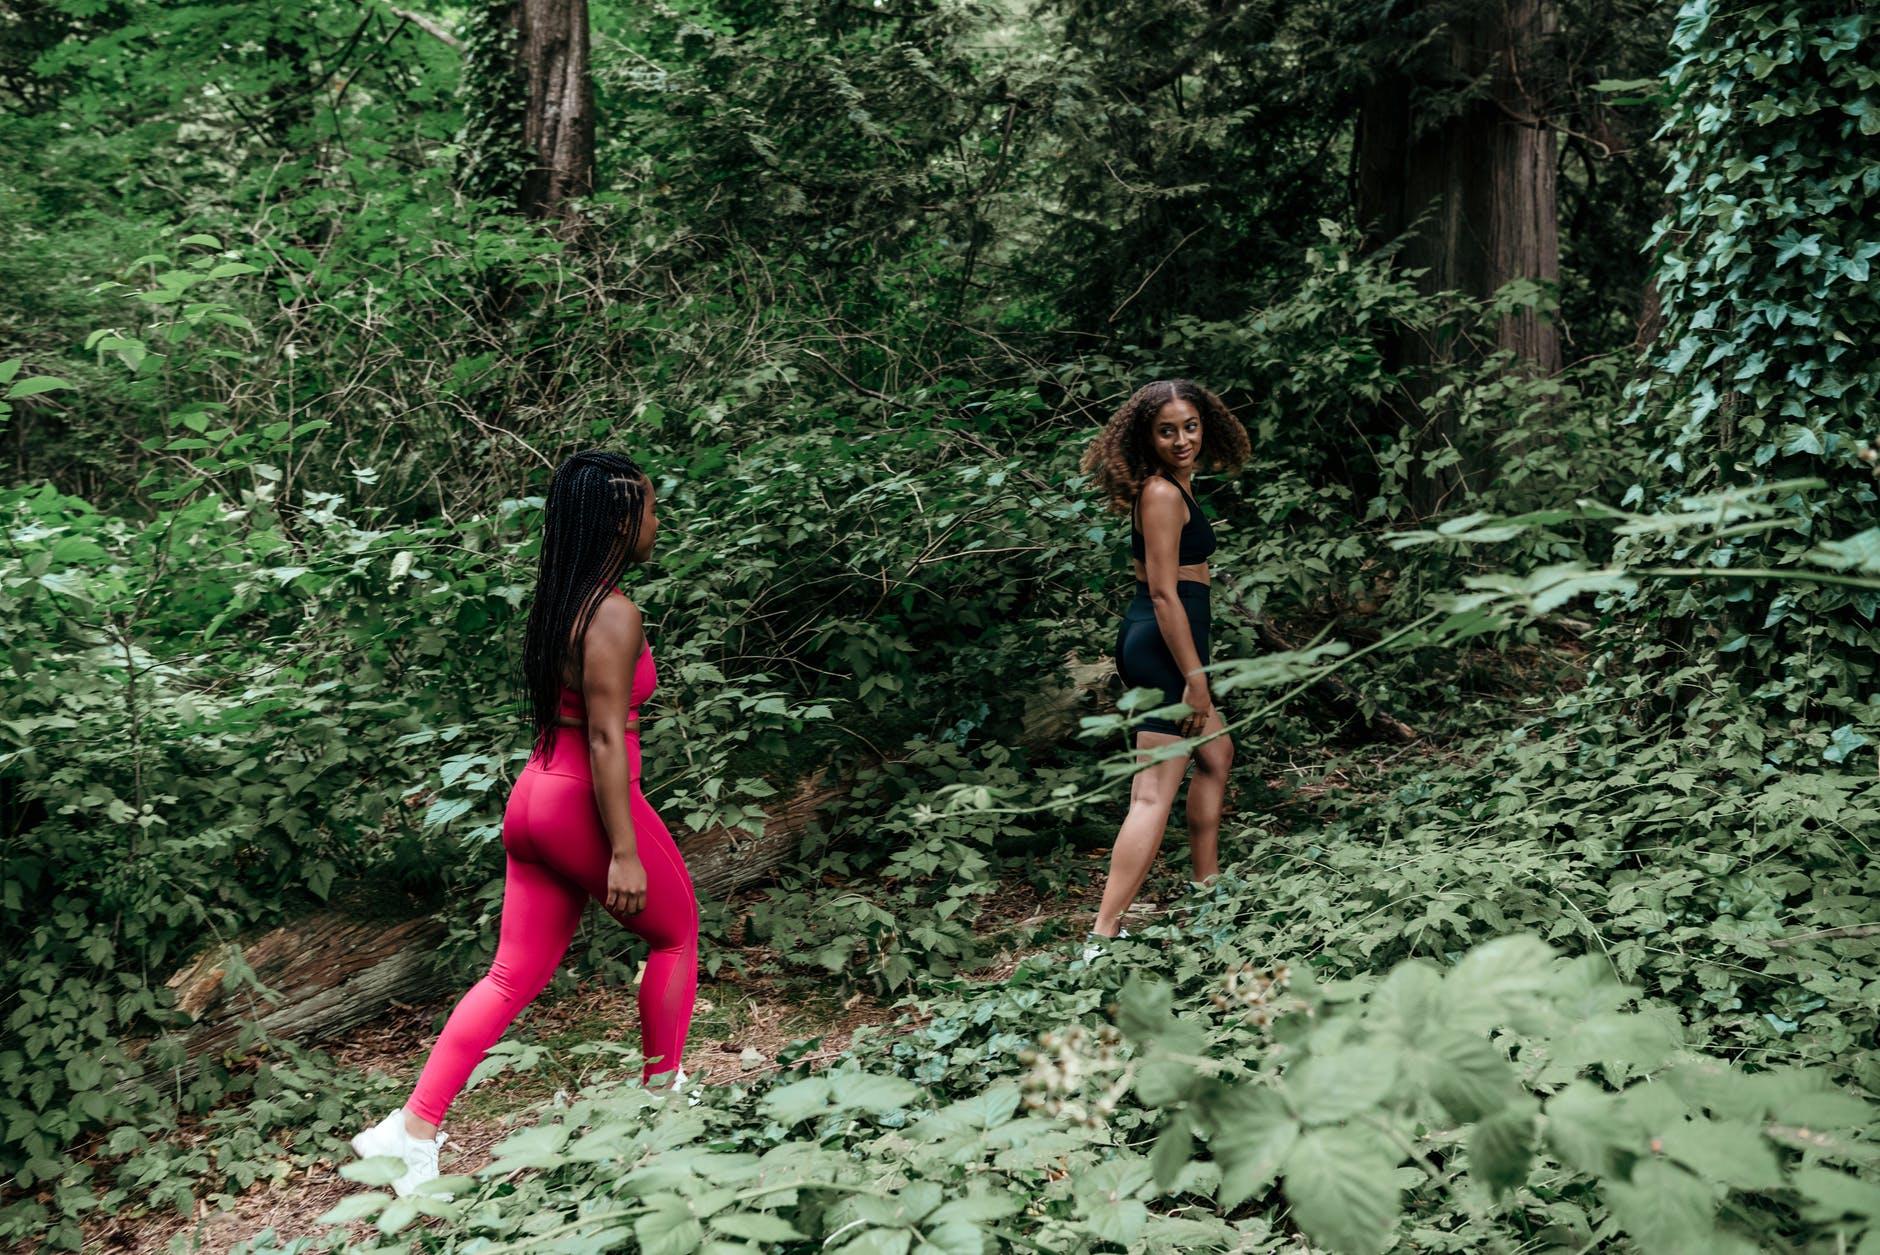 two friends walking in a forest